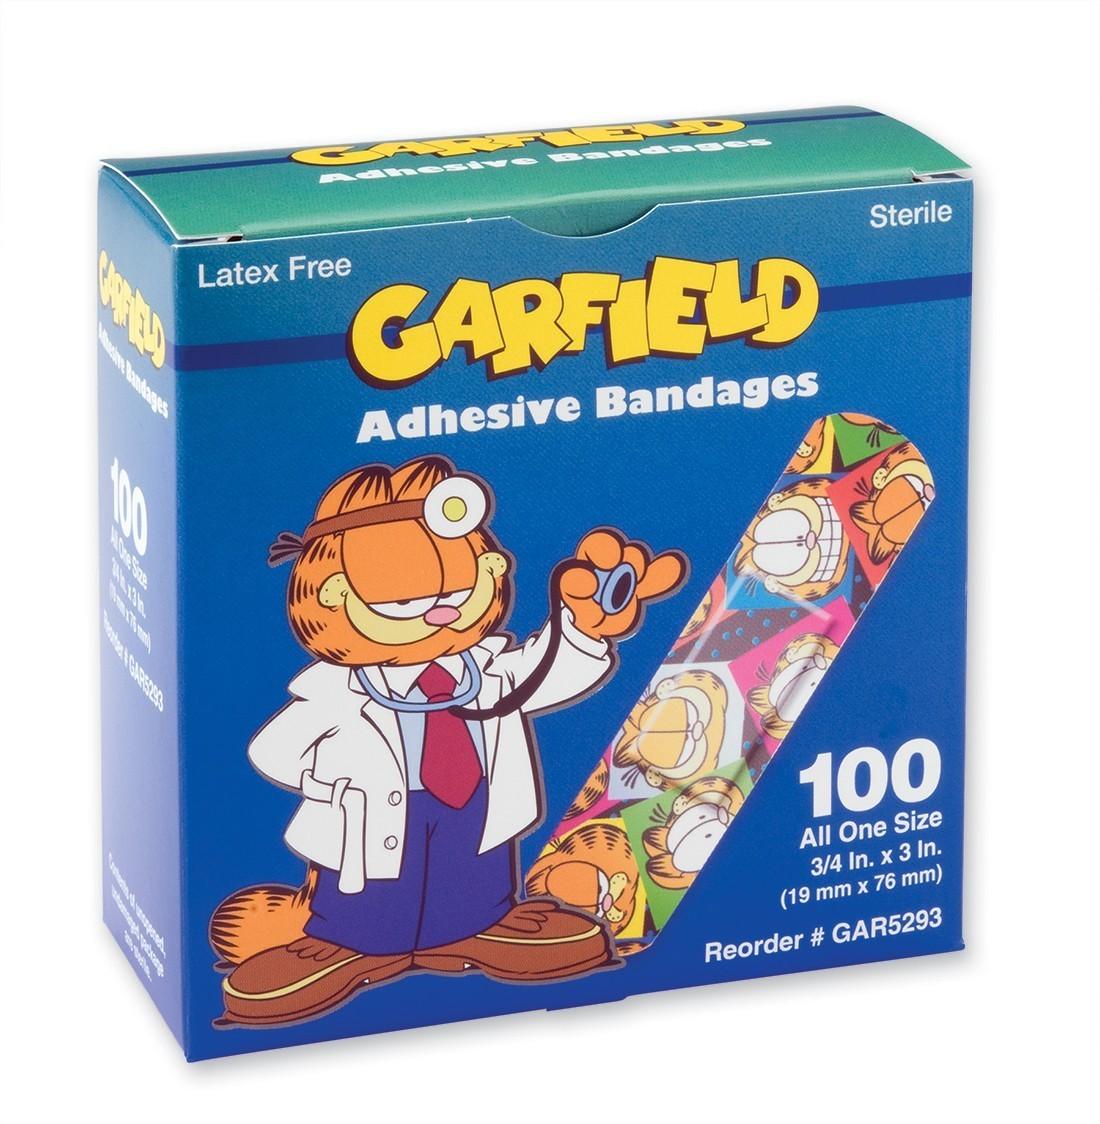 Case Garfield® Bandages [image]